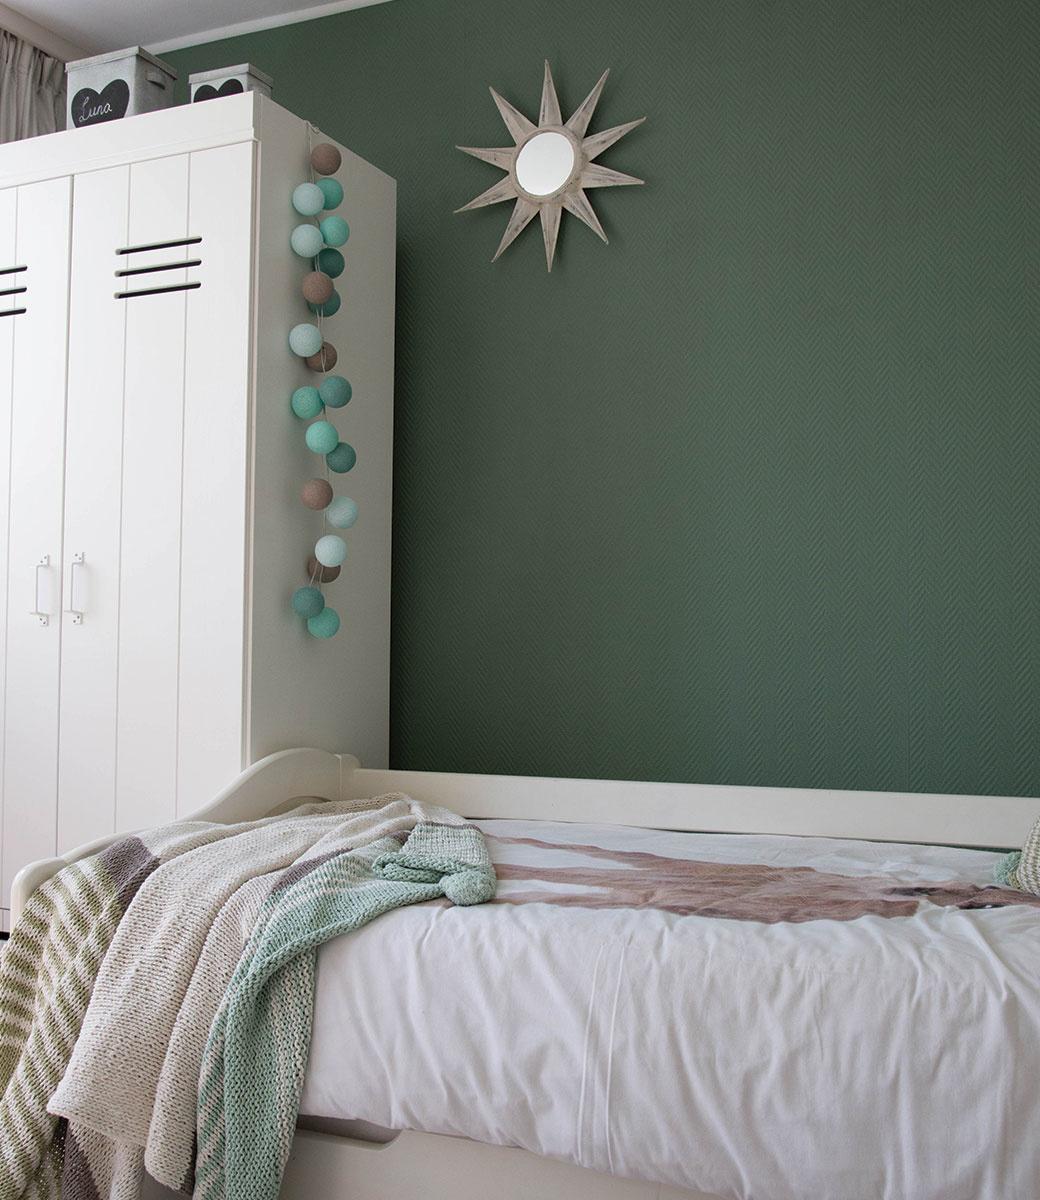 Cotton Ball Lights Inspiration Bedroom Regular Mint String Light Cotton Ball Lights